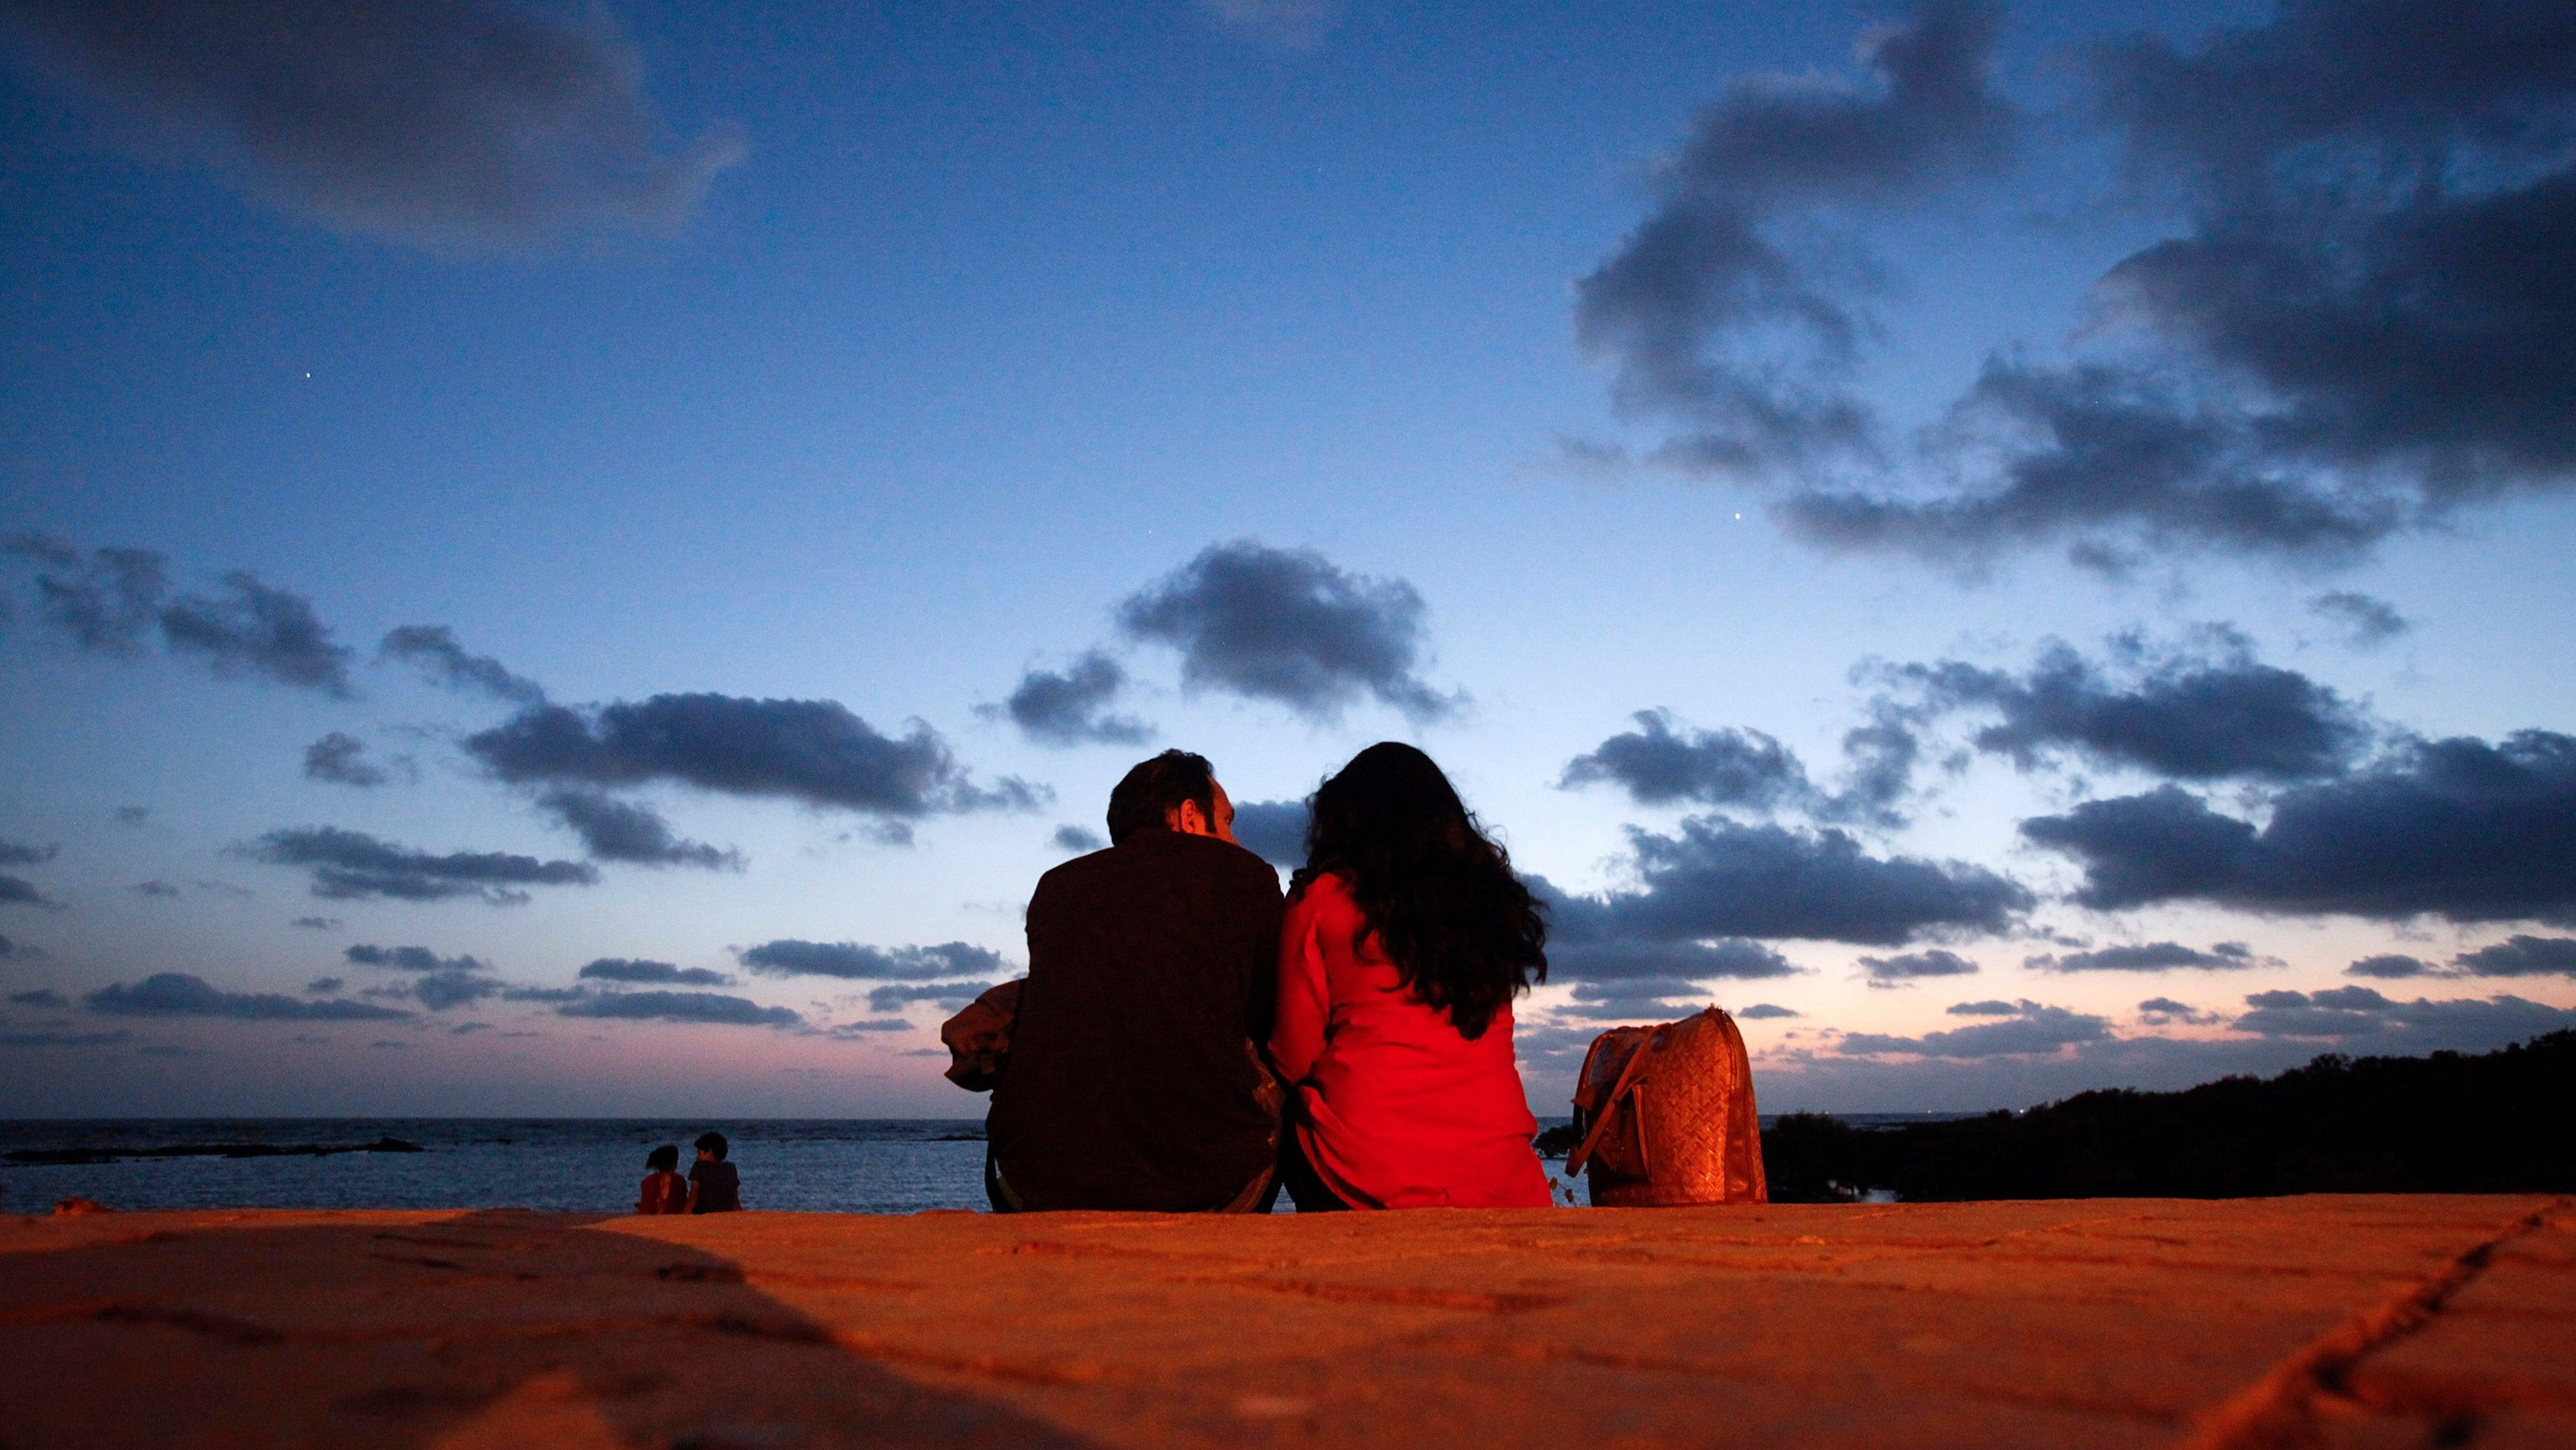 Dating sites in india pune zip code